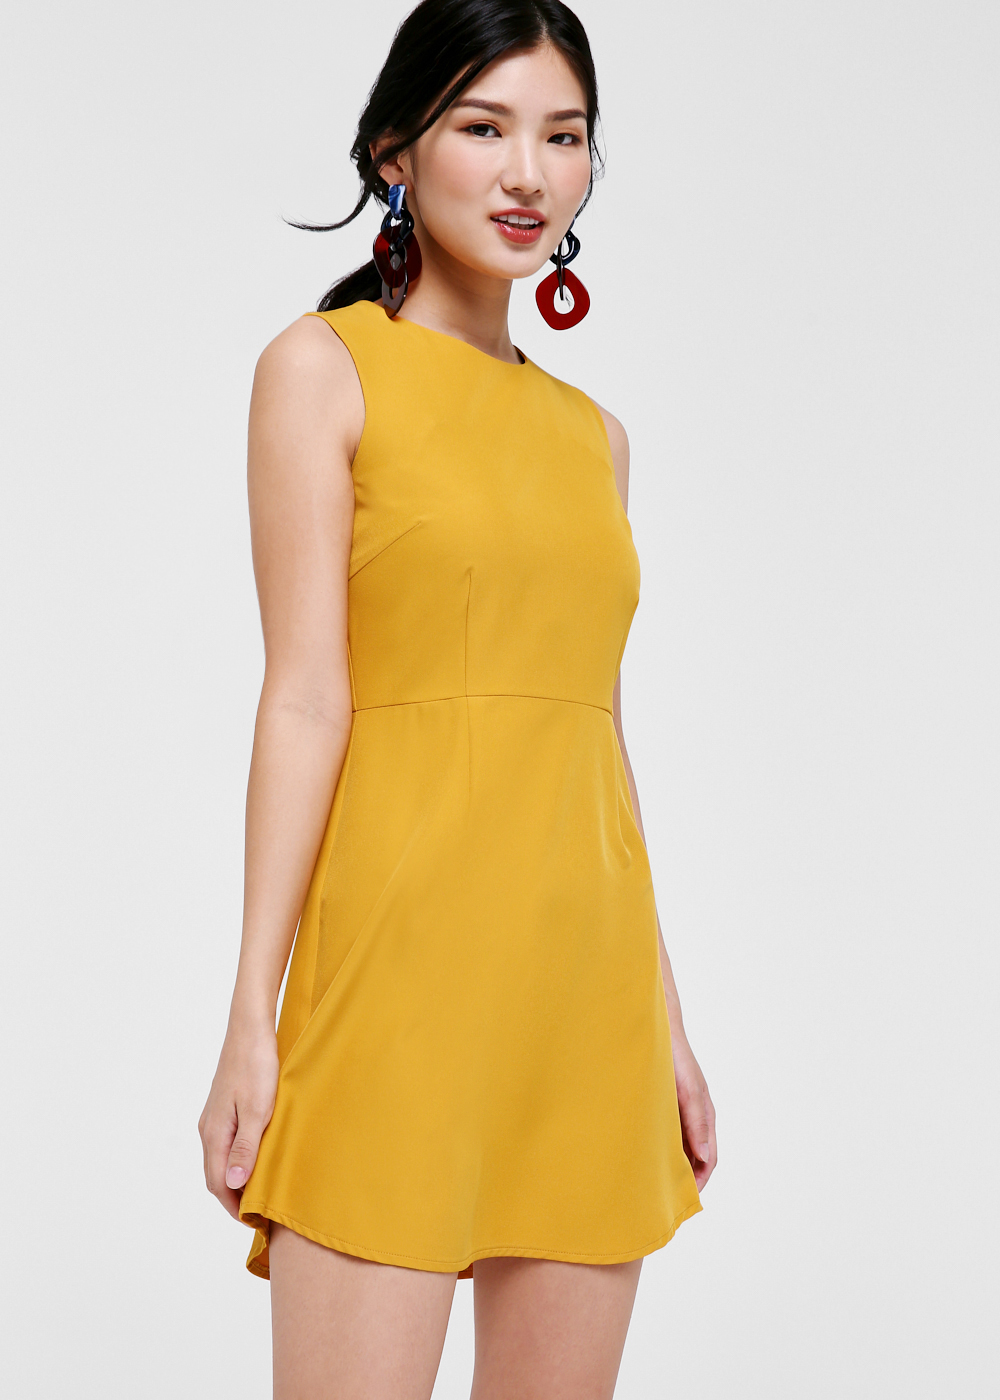 Desiree Curved Hem A-line Dress-091-XS